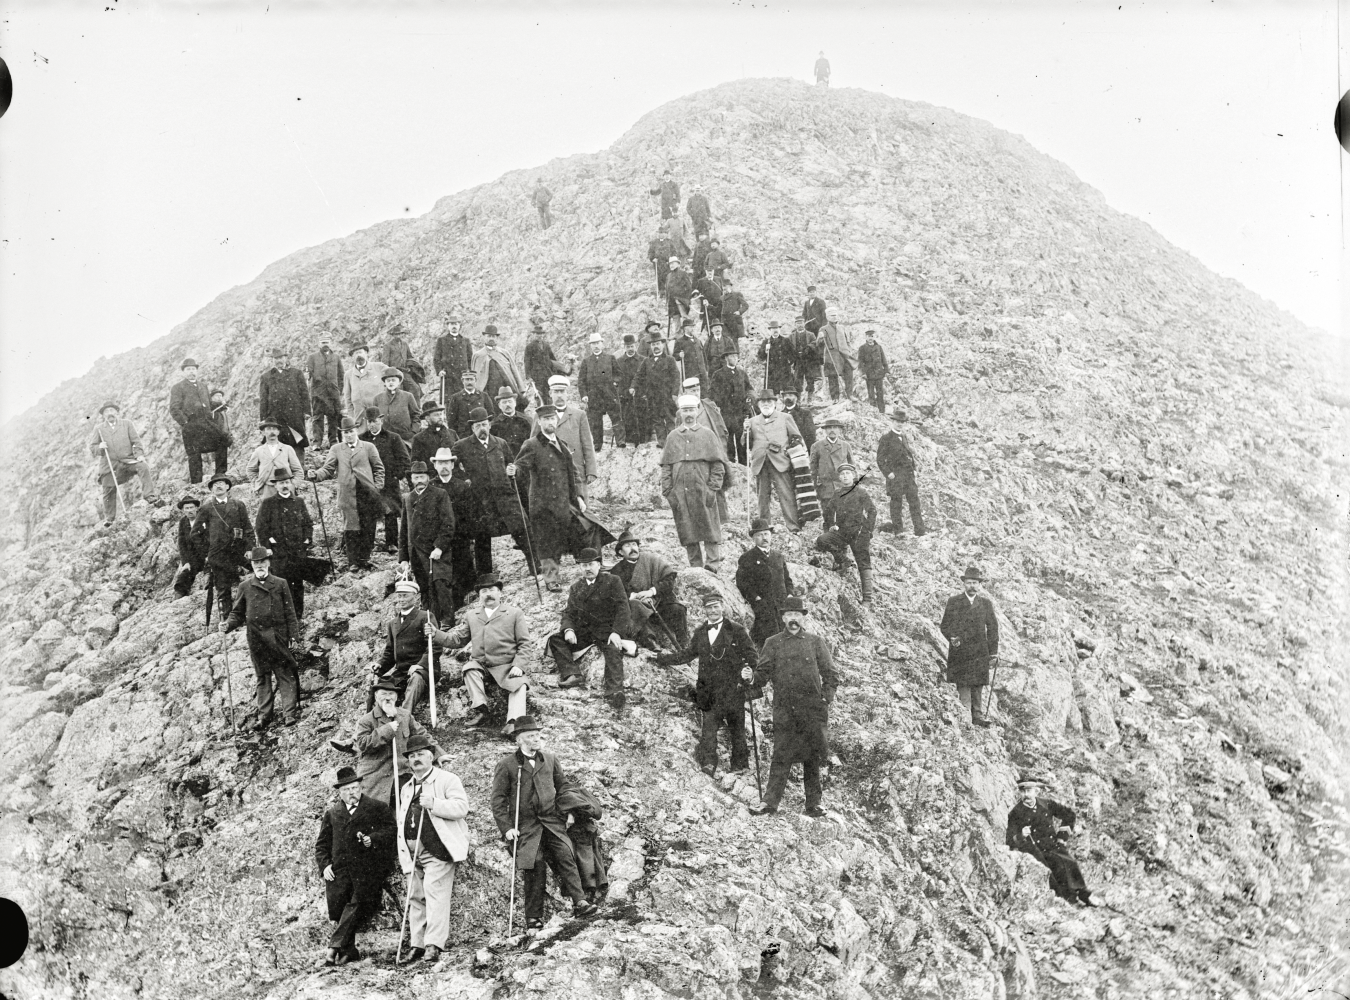 HjalmarLundbohm med studiegrupp på Kiirunavaara 1901